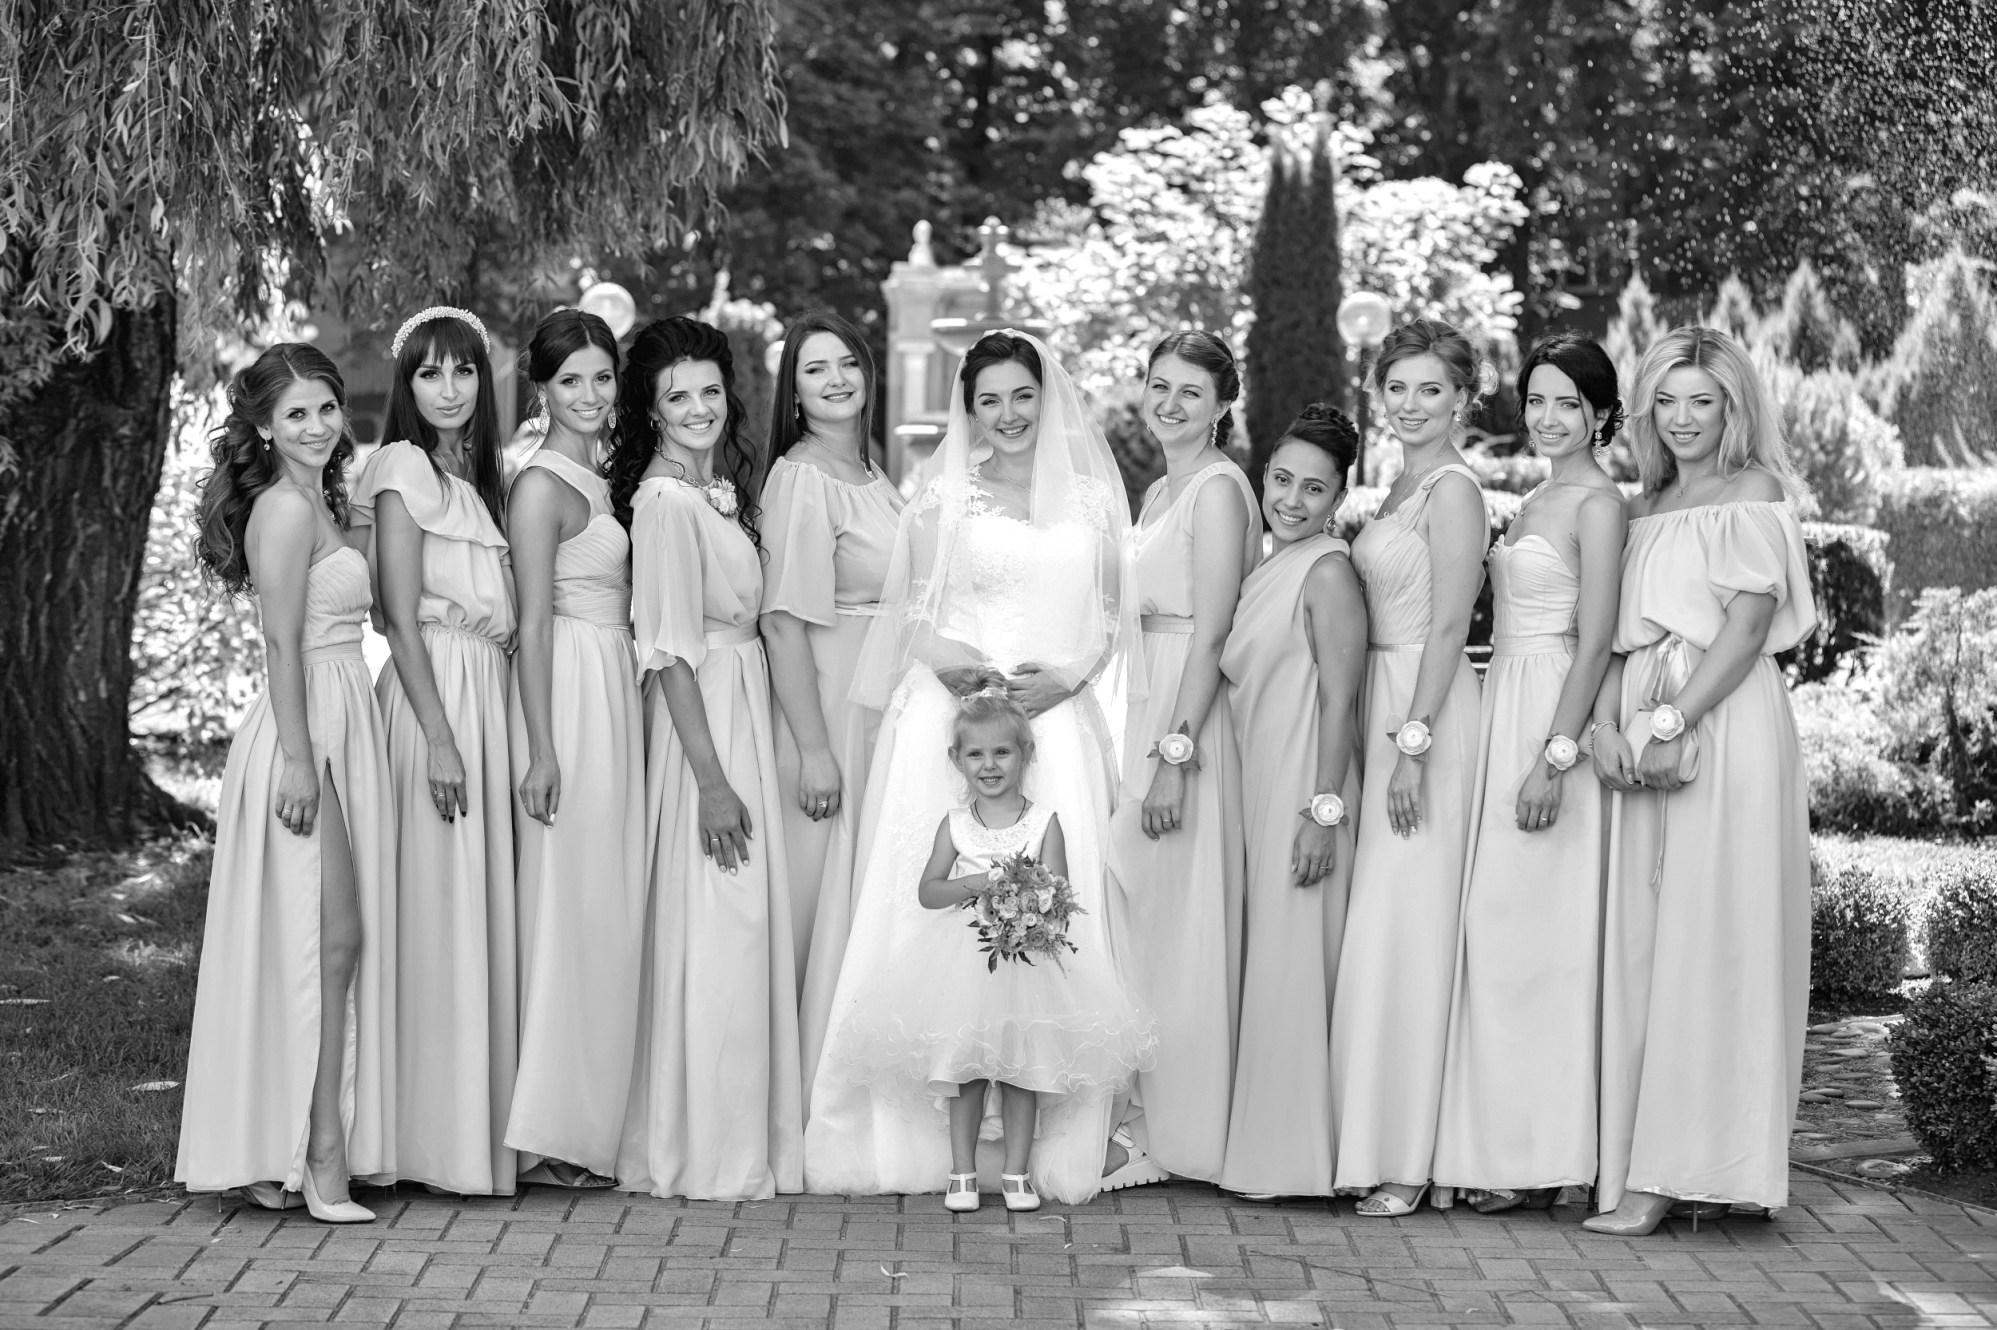 CANON WEDDING BRIDESMAIDS WITH BRIDE PHOTO AWARDS 003420 (Custom)